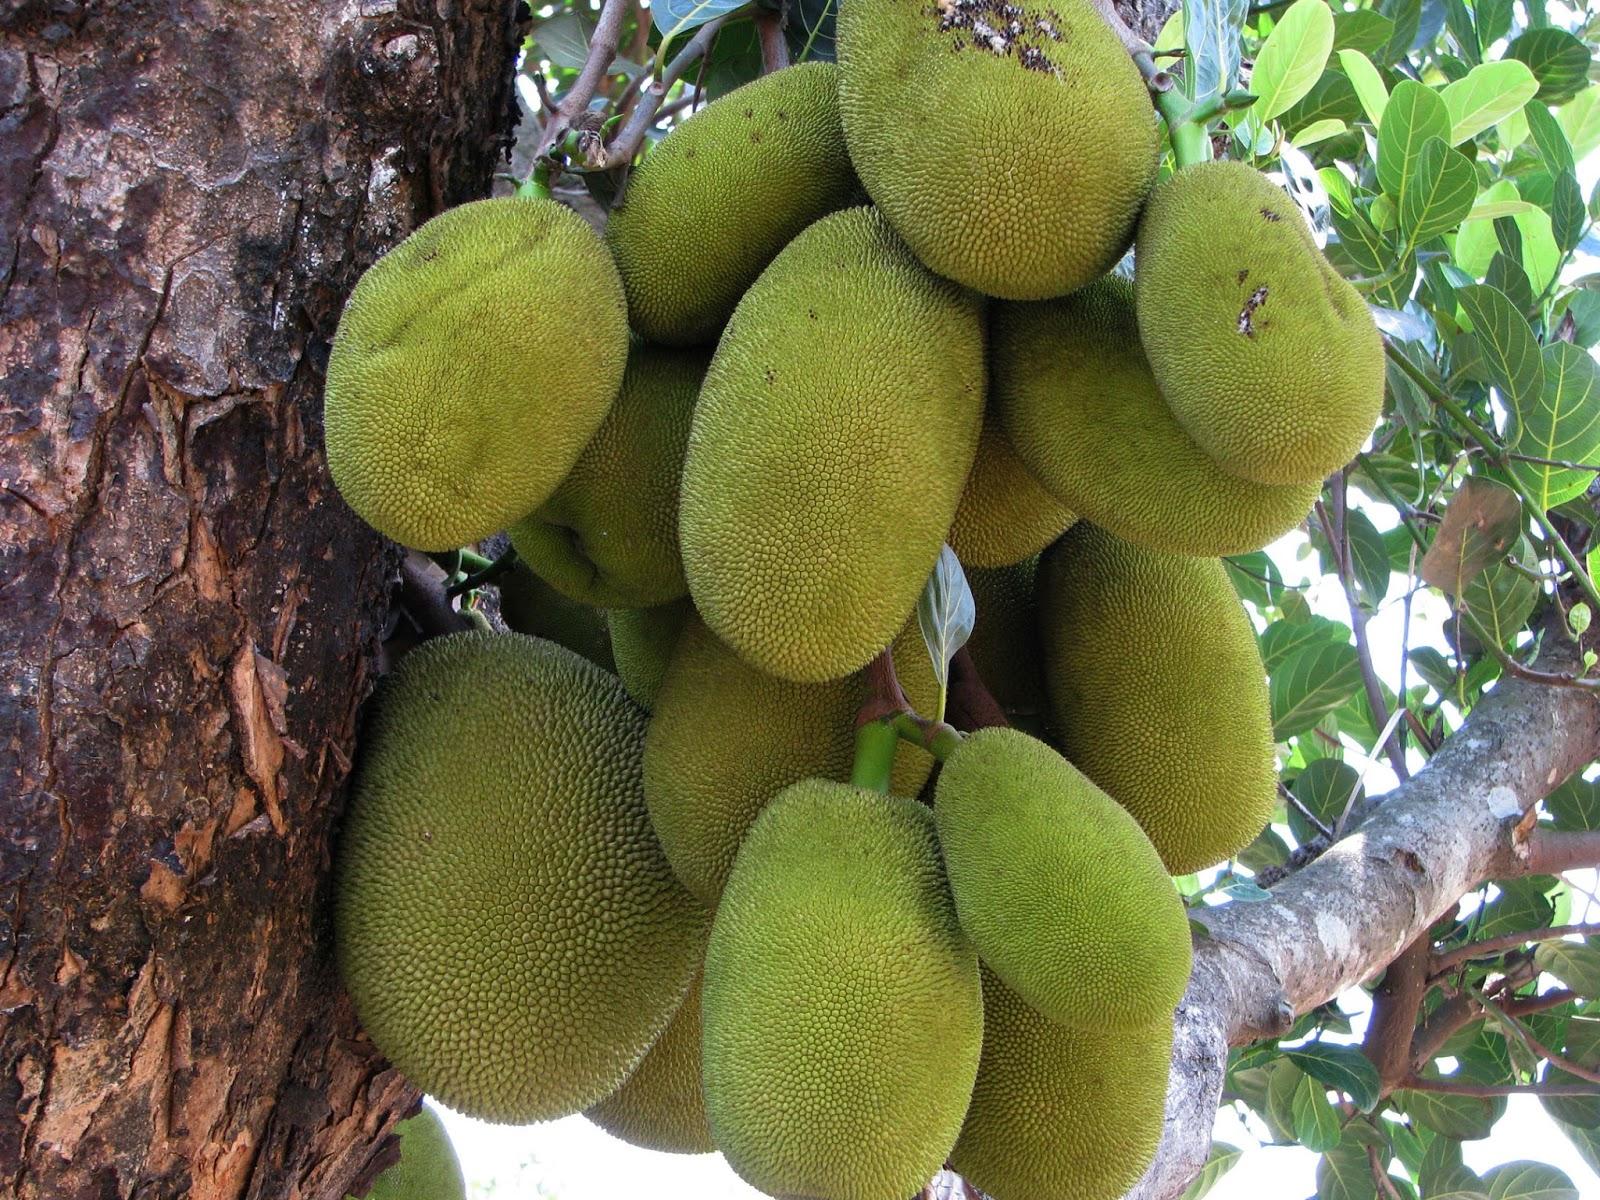 how to make pineapple jam in malayalam